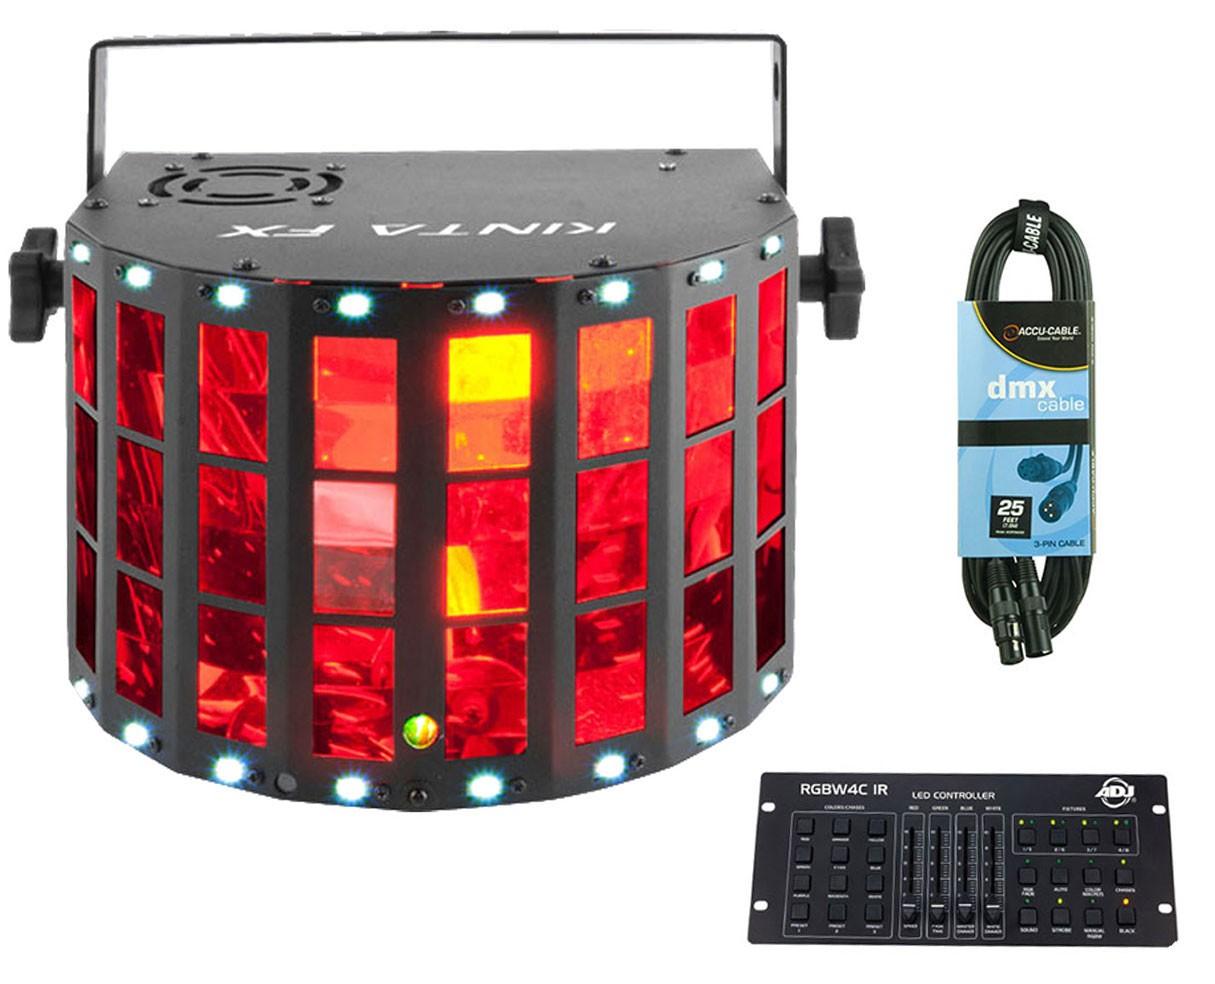 Chauvet Kinta FX + RGBW4C IR + Cable